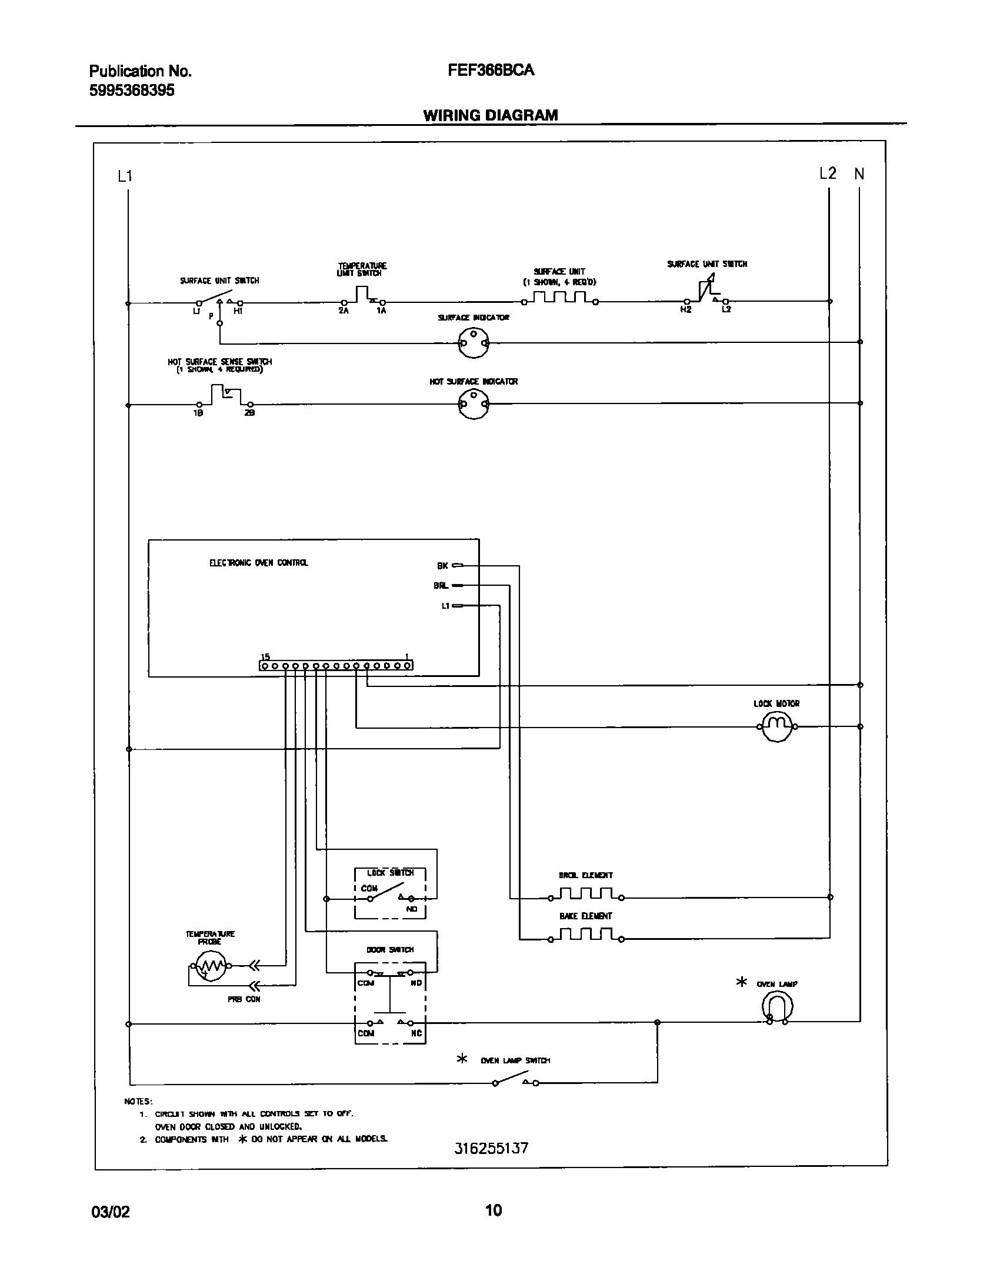 Fef366bca Frigidaire Company Backguard 05body 07top Drawer 09door 01cover 10wiring Diagram